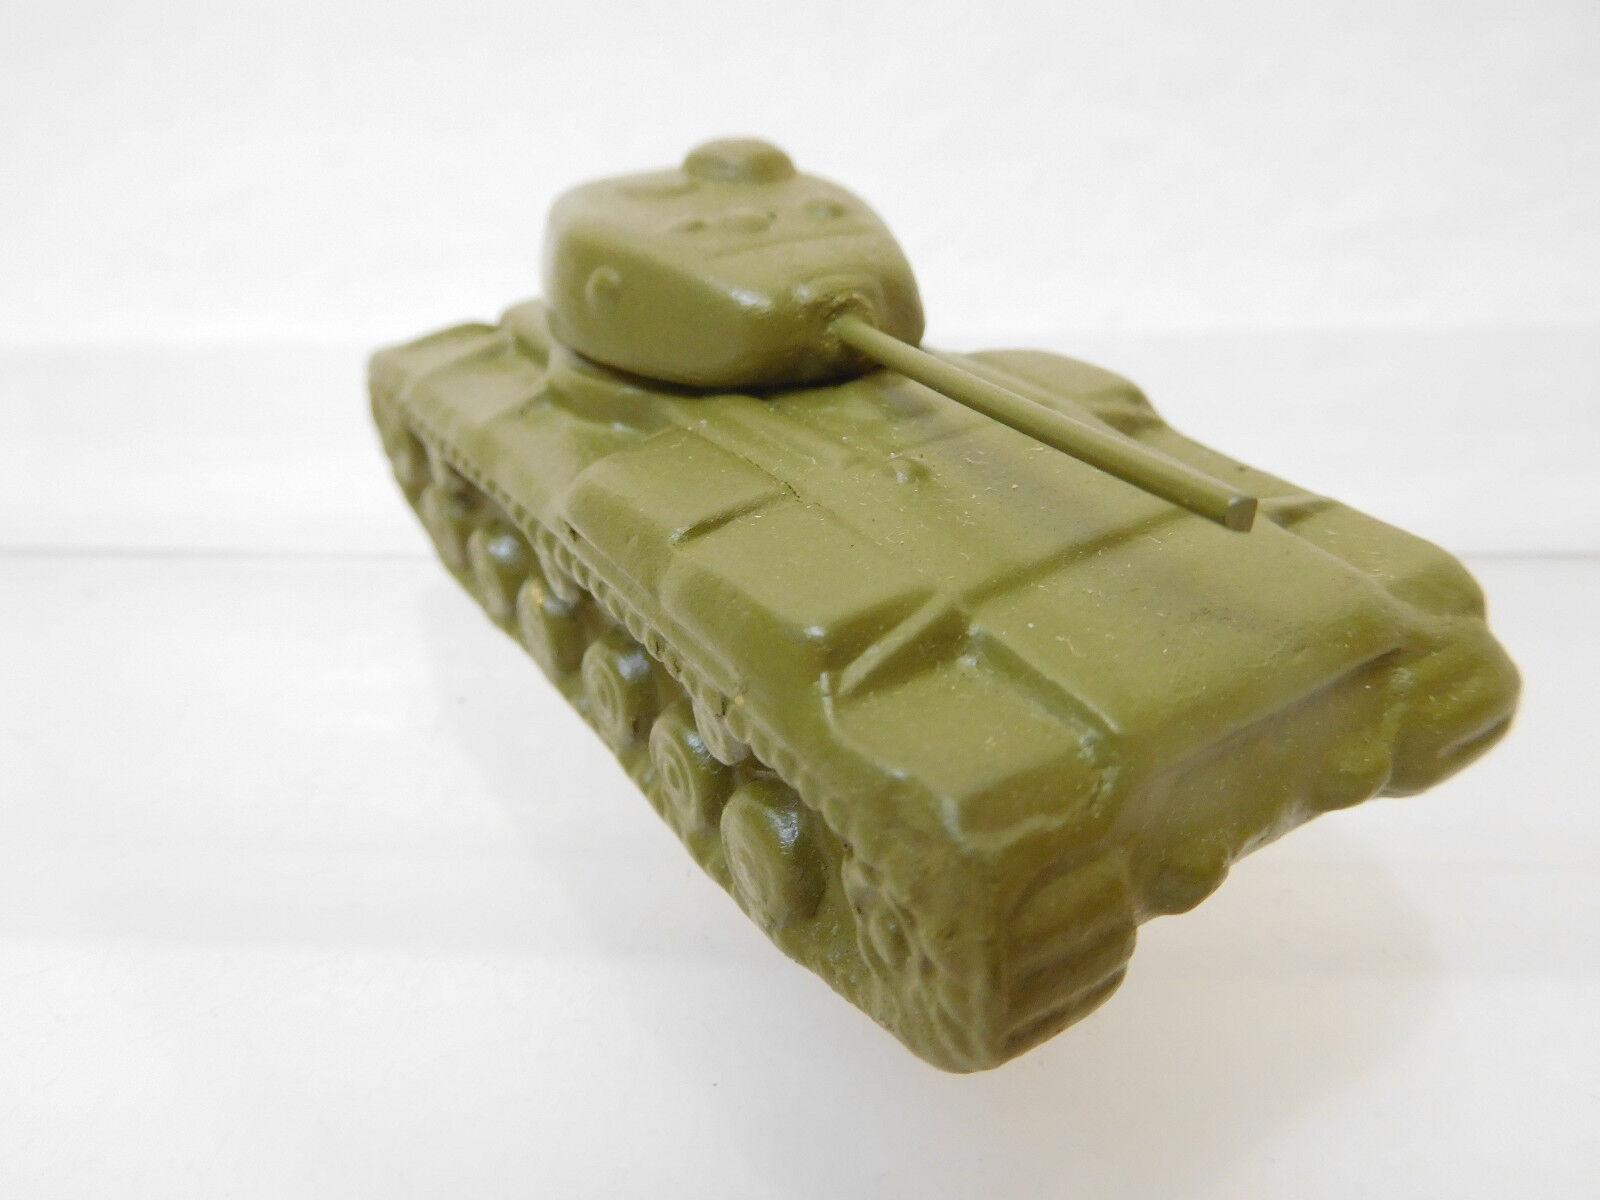 Mes-55451 edad Goebel cerámica tanques L  aprox. 73mm, con farbschaden